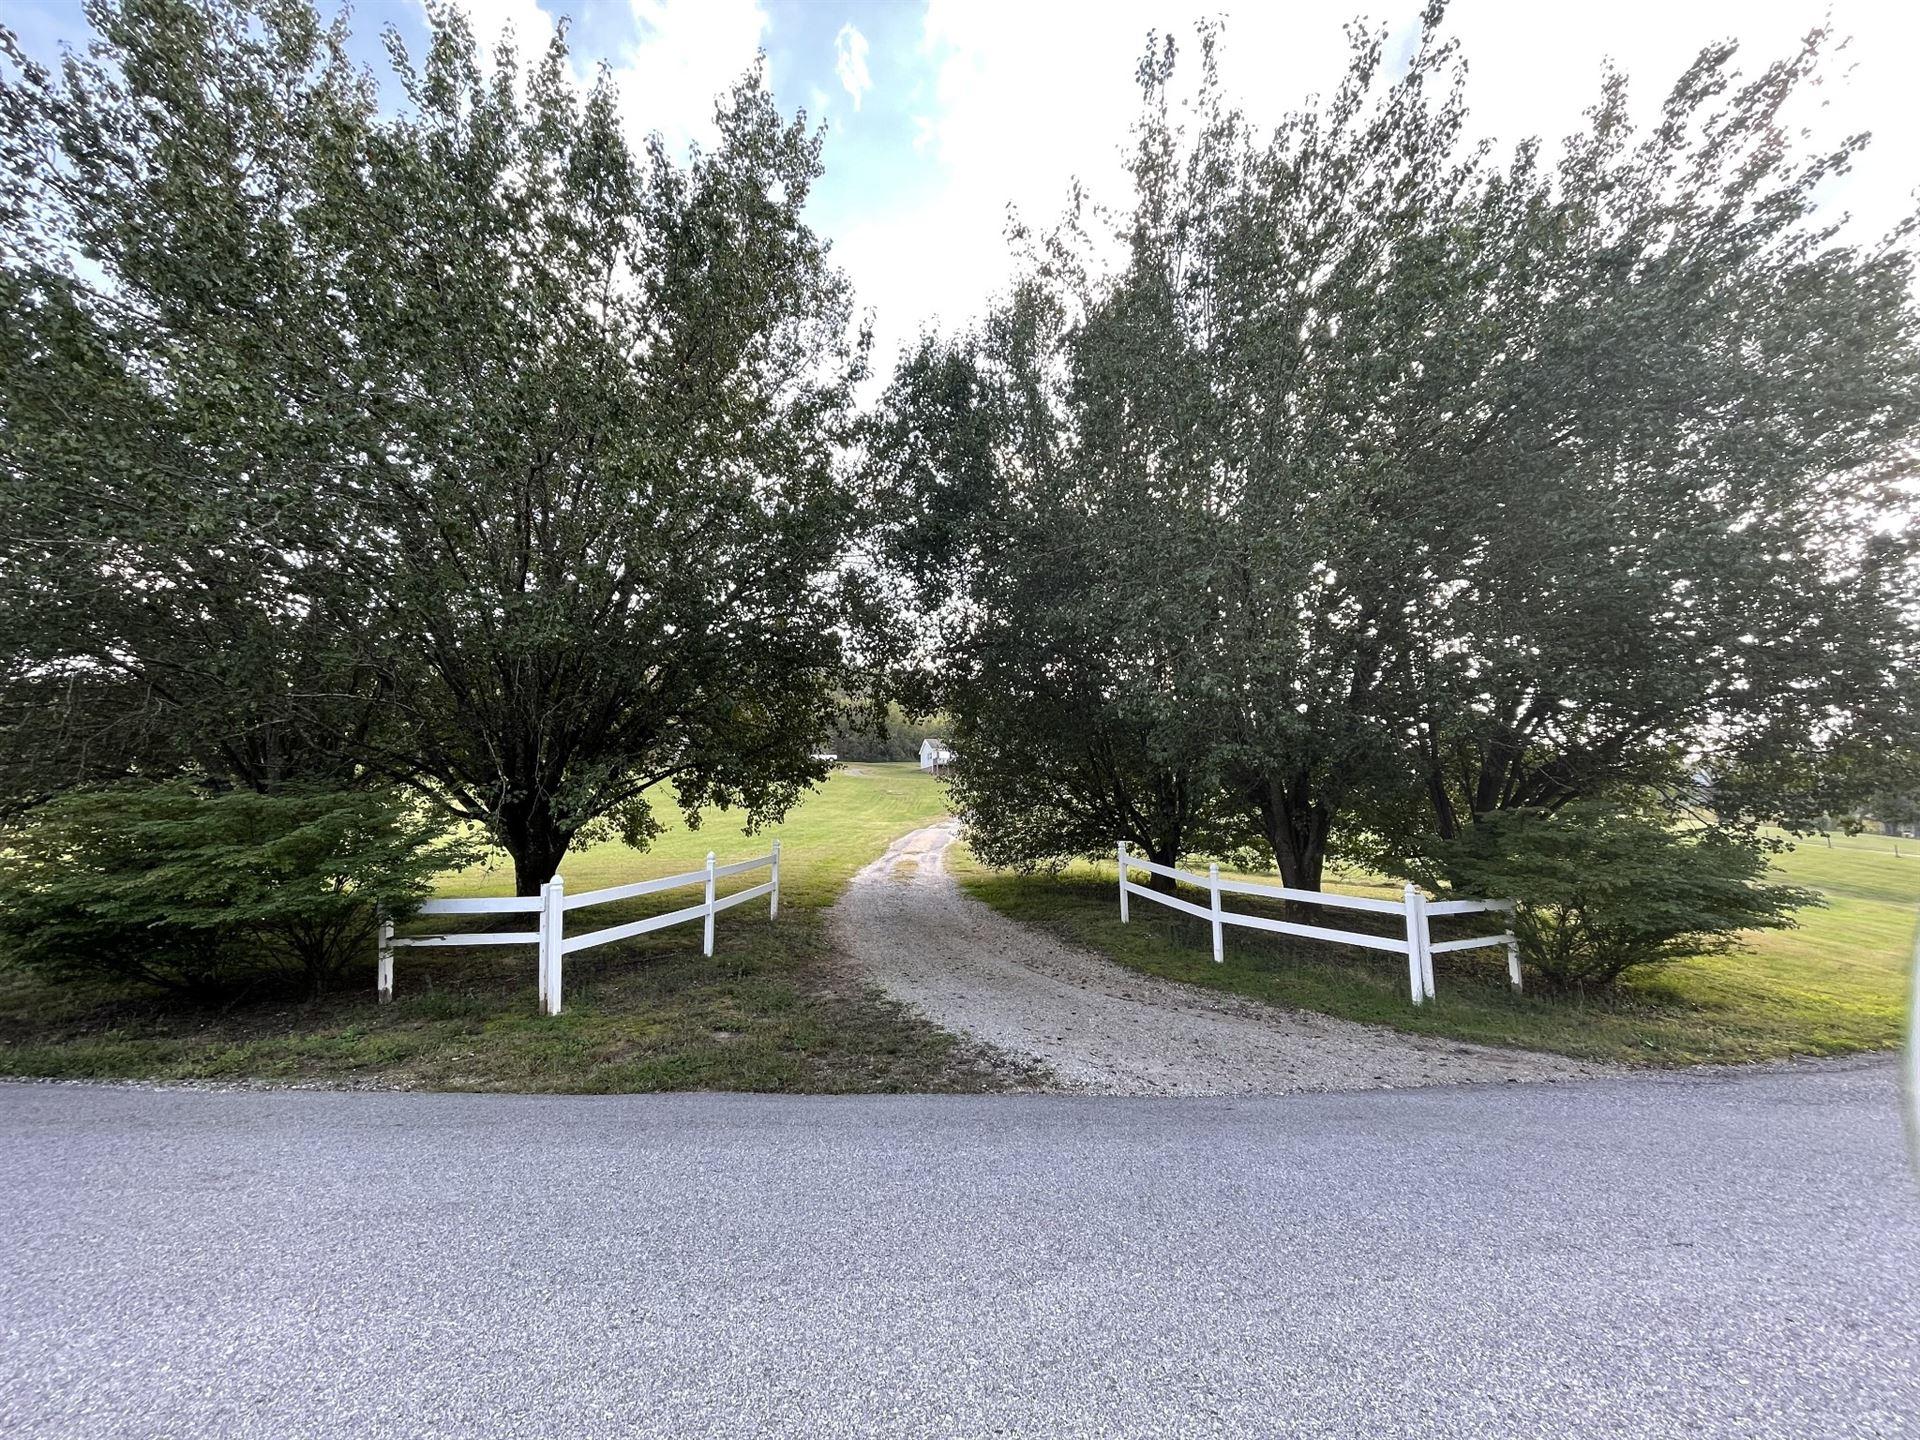 Photo of 550 Sullivan Bend Rd, Elmwood, TN 38560 (MLS # 2300595)